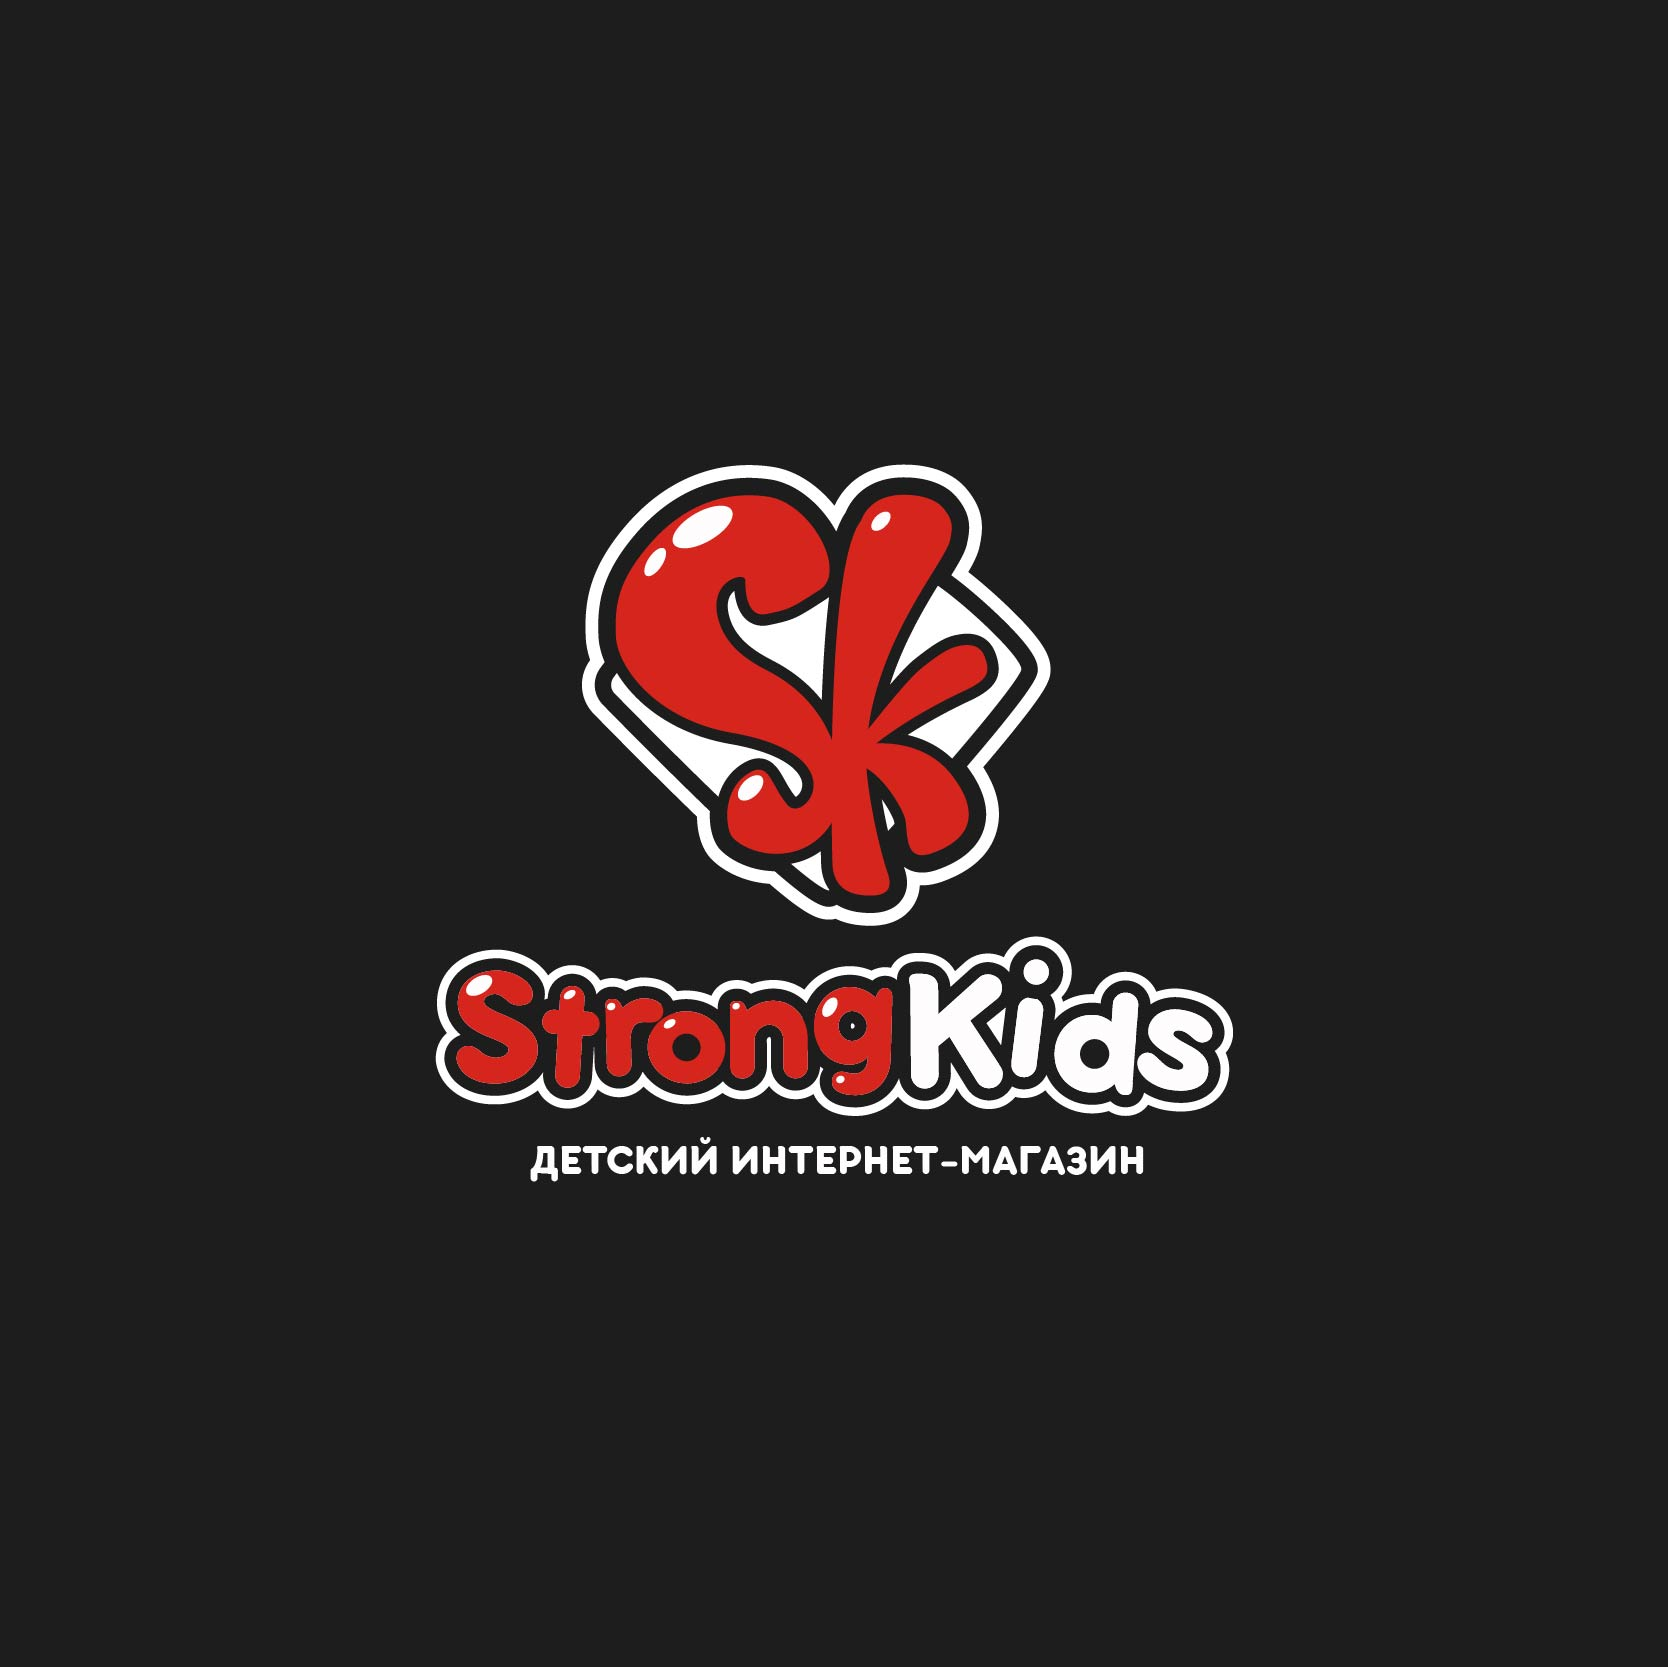 Логотип для Детского Интернет Магазина StrongKids фото f_3565c7fe8cccaee1.jpg